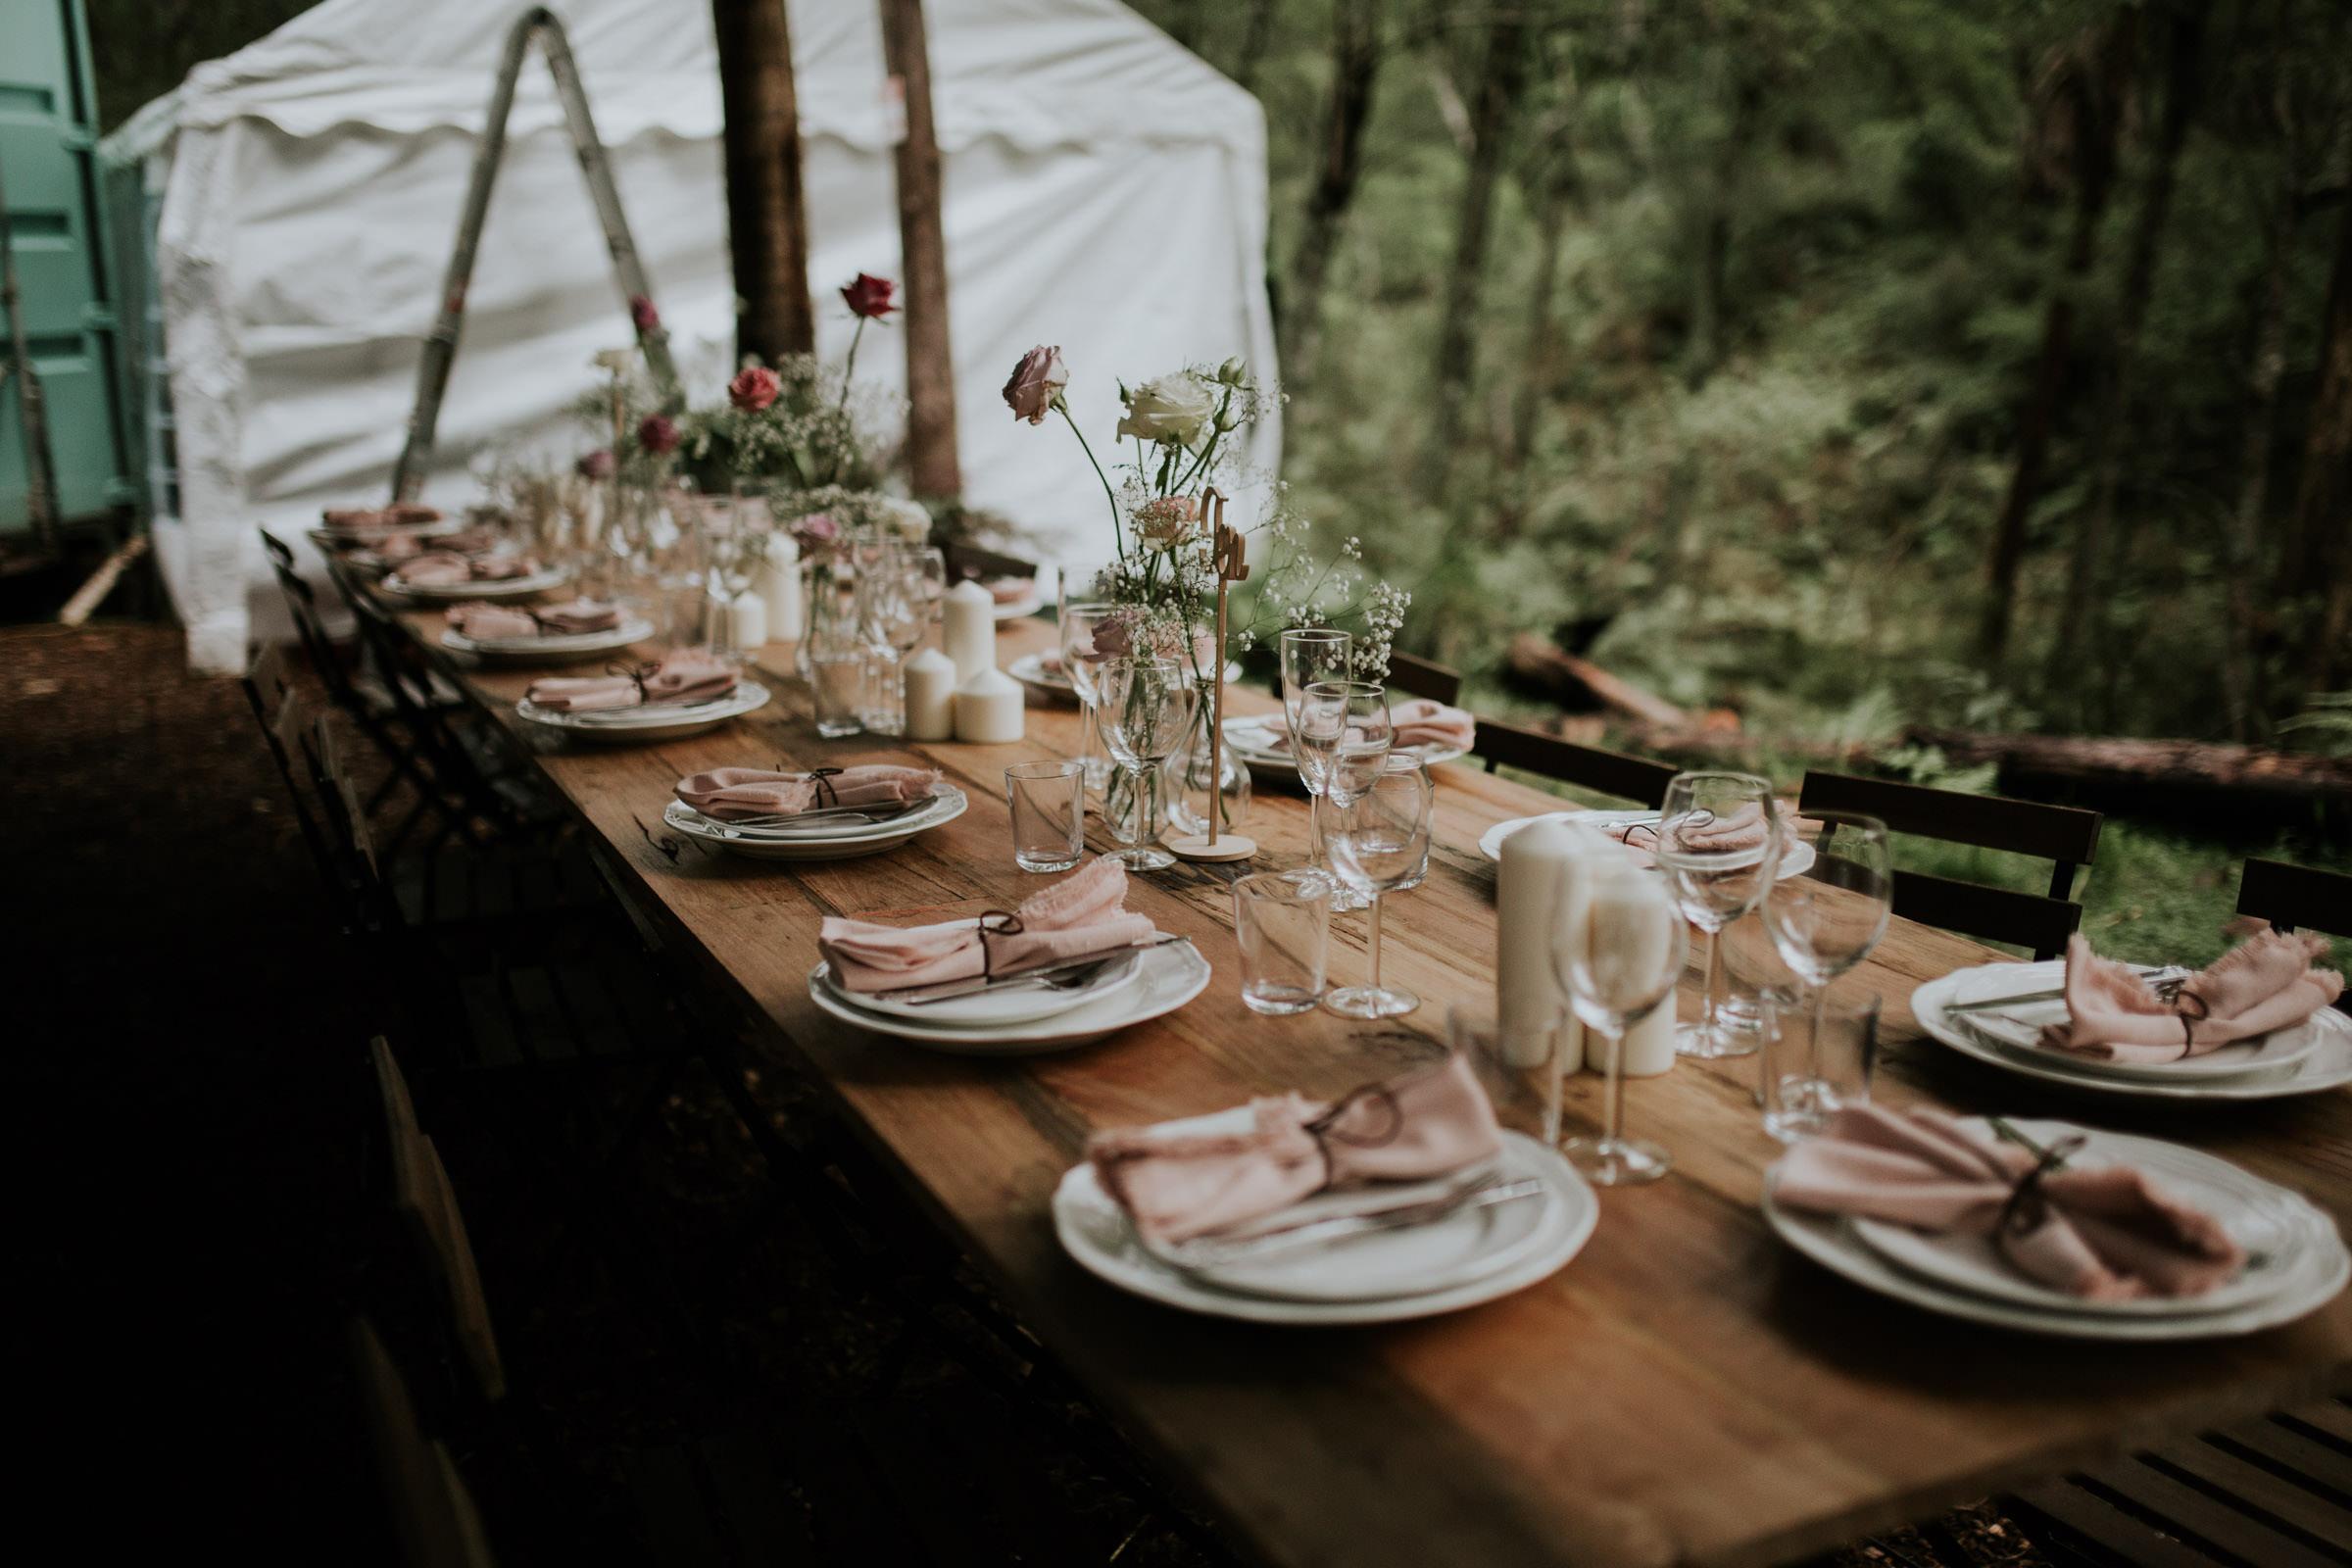 Emma+John+Far+South+Coast+Wedding+Festivl+Glamping+Bush+STYLING-1.jpg